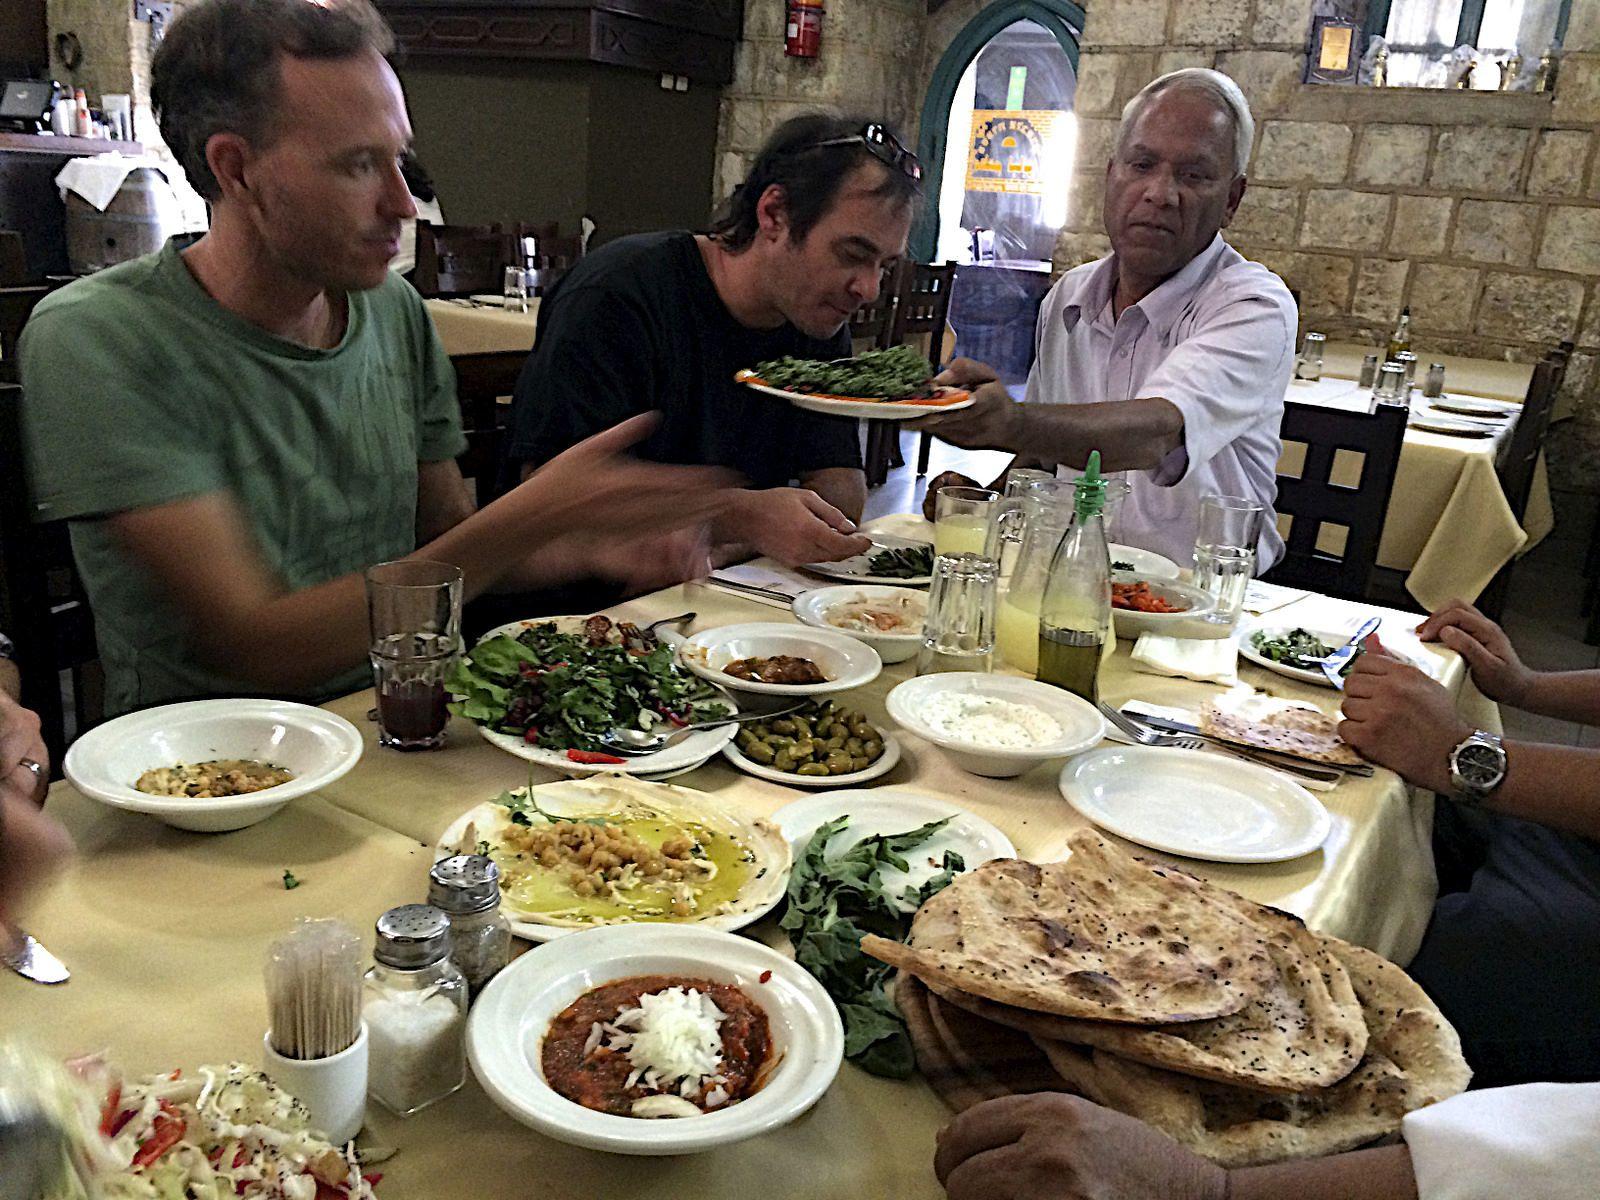 New film set to reveal Israels biggest secret its food